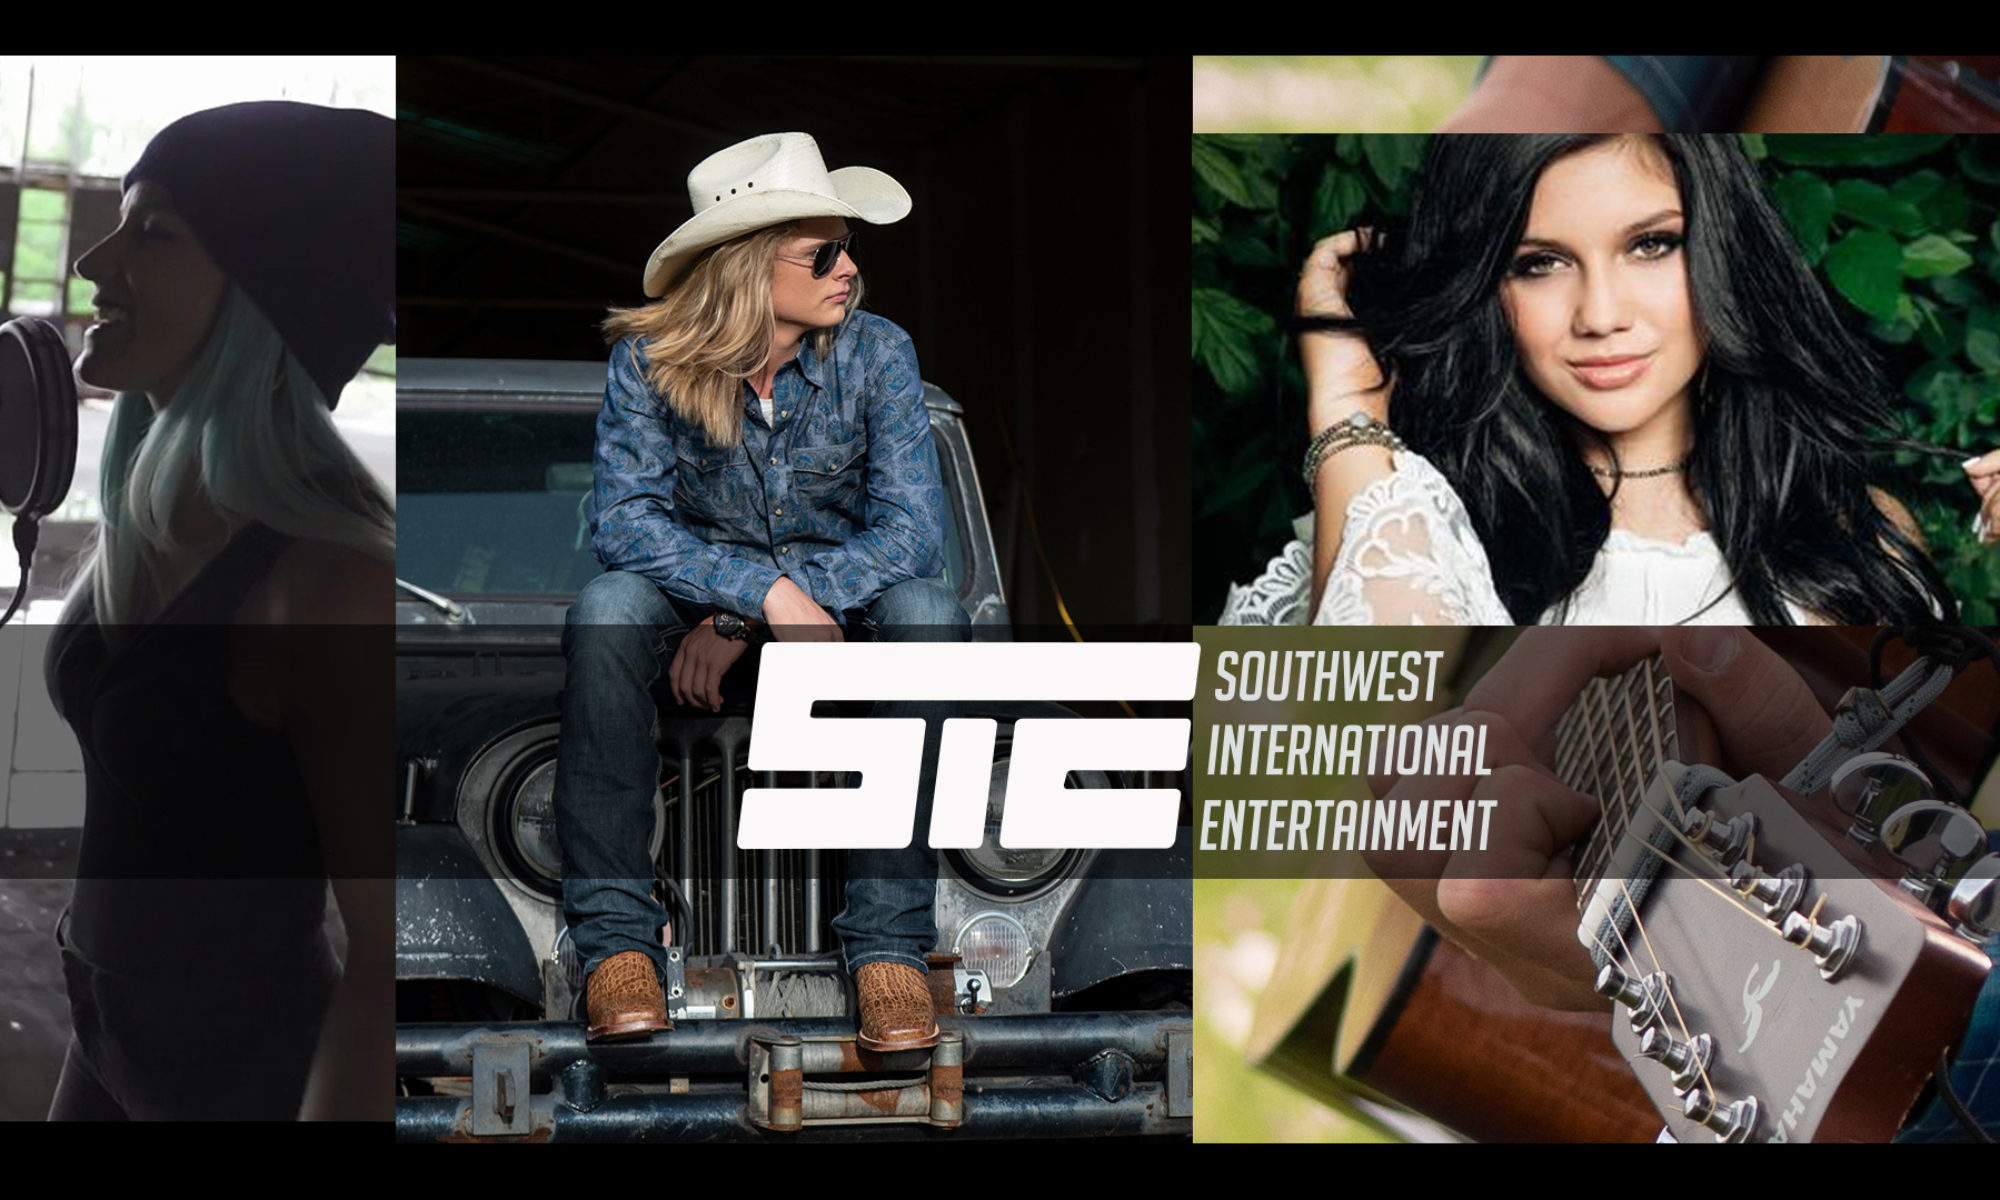 Southwest International Entertainment